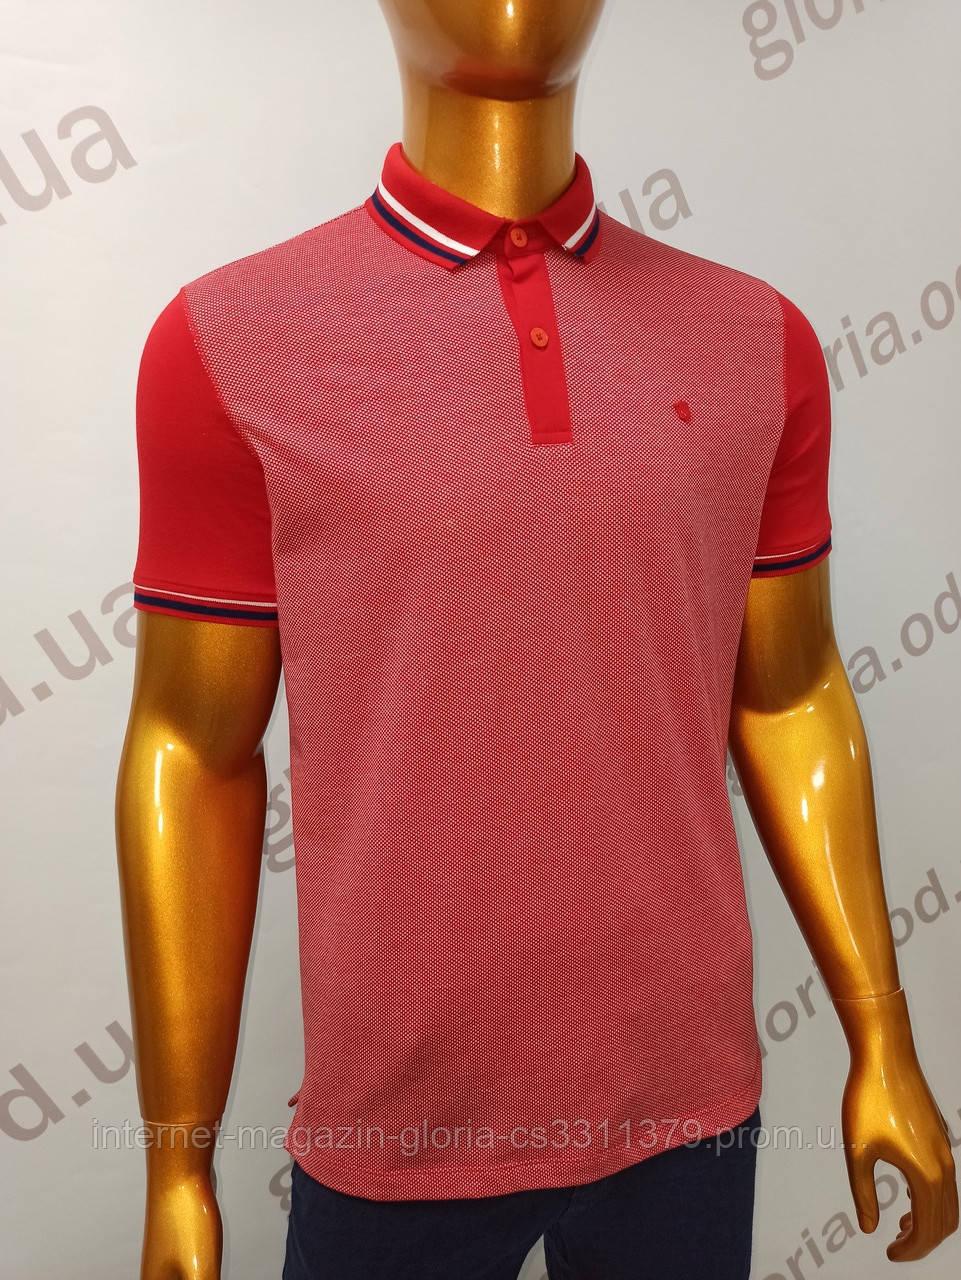 Мужская футболка Поло, MСL . PSL-26835. Размеры: M,L,XL,XXL.